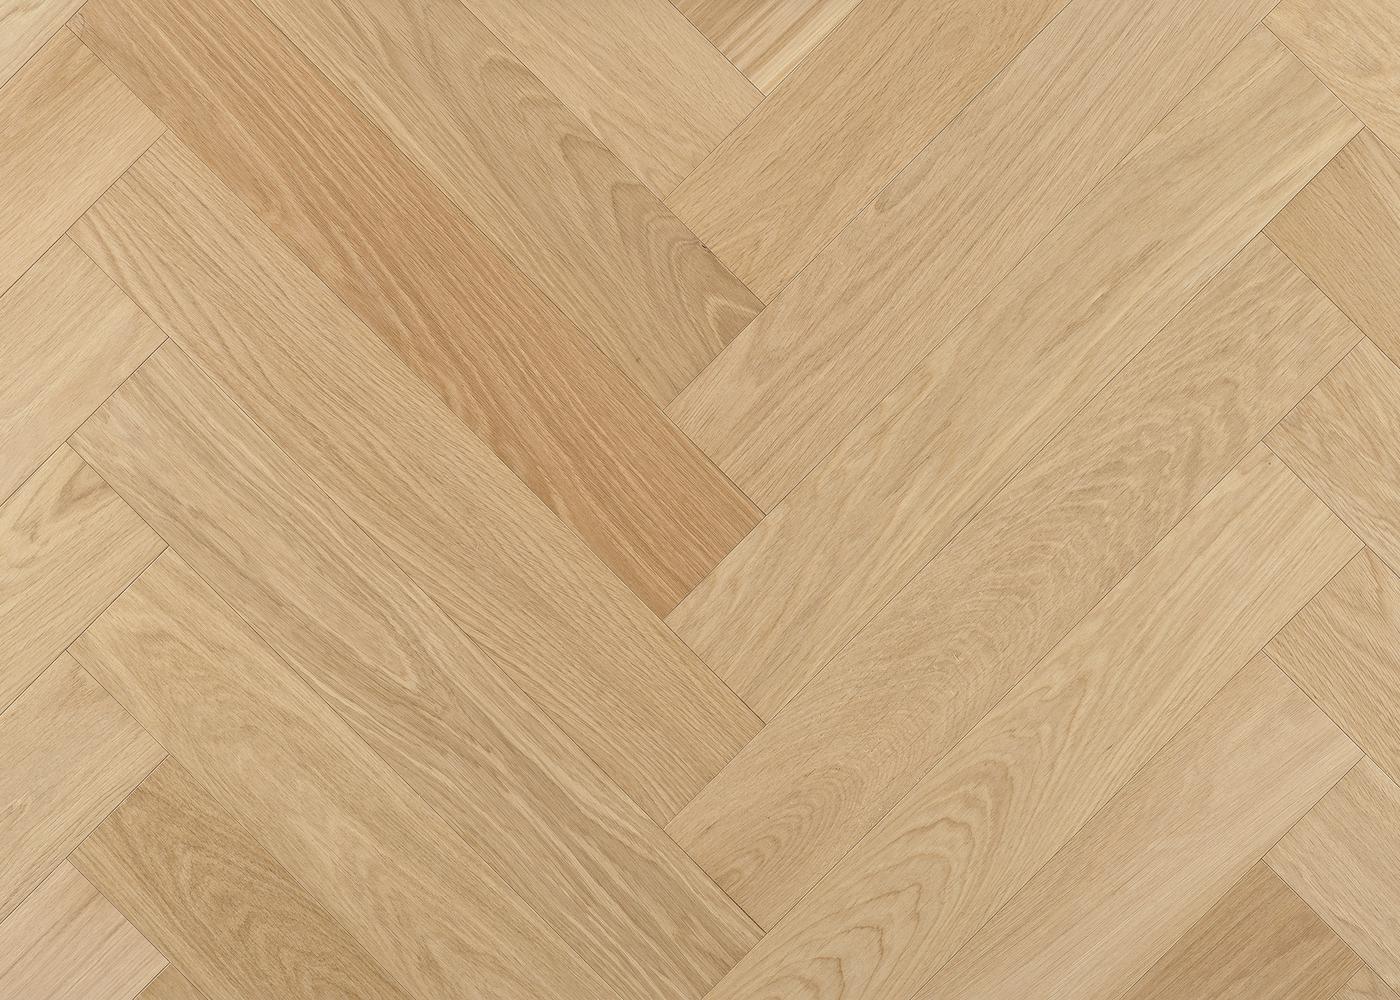 Parquet chêne contrecollé TALLINN Bâton Rompu brossé huile UV Select support HDF 10x92x610